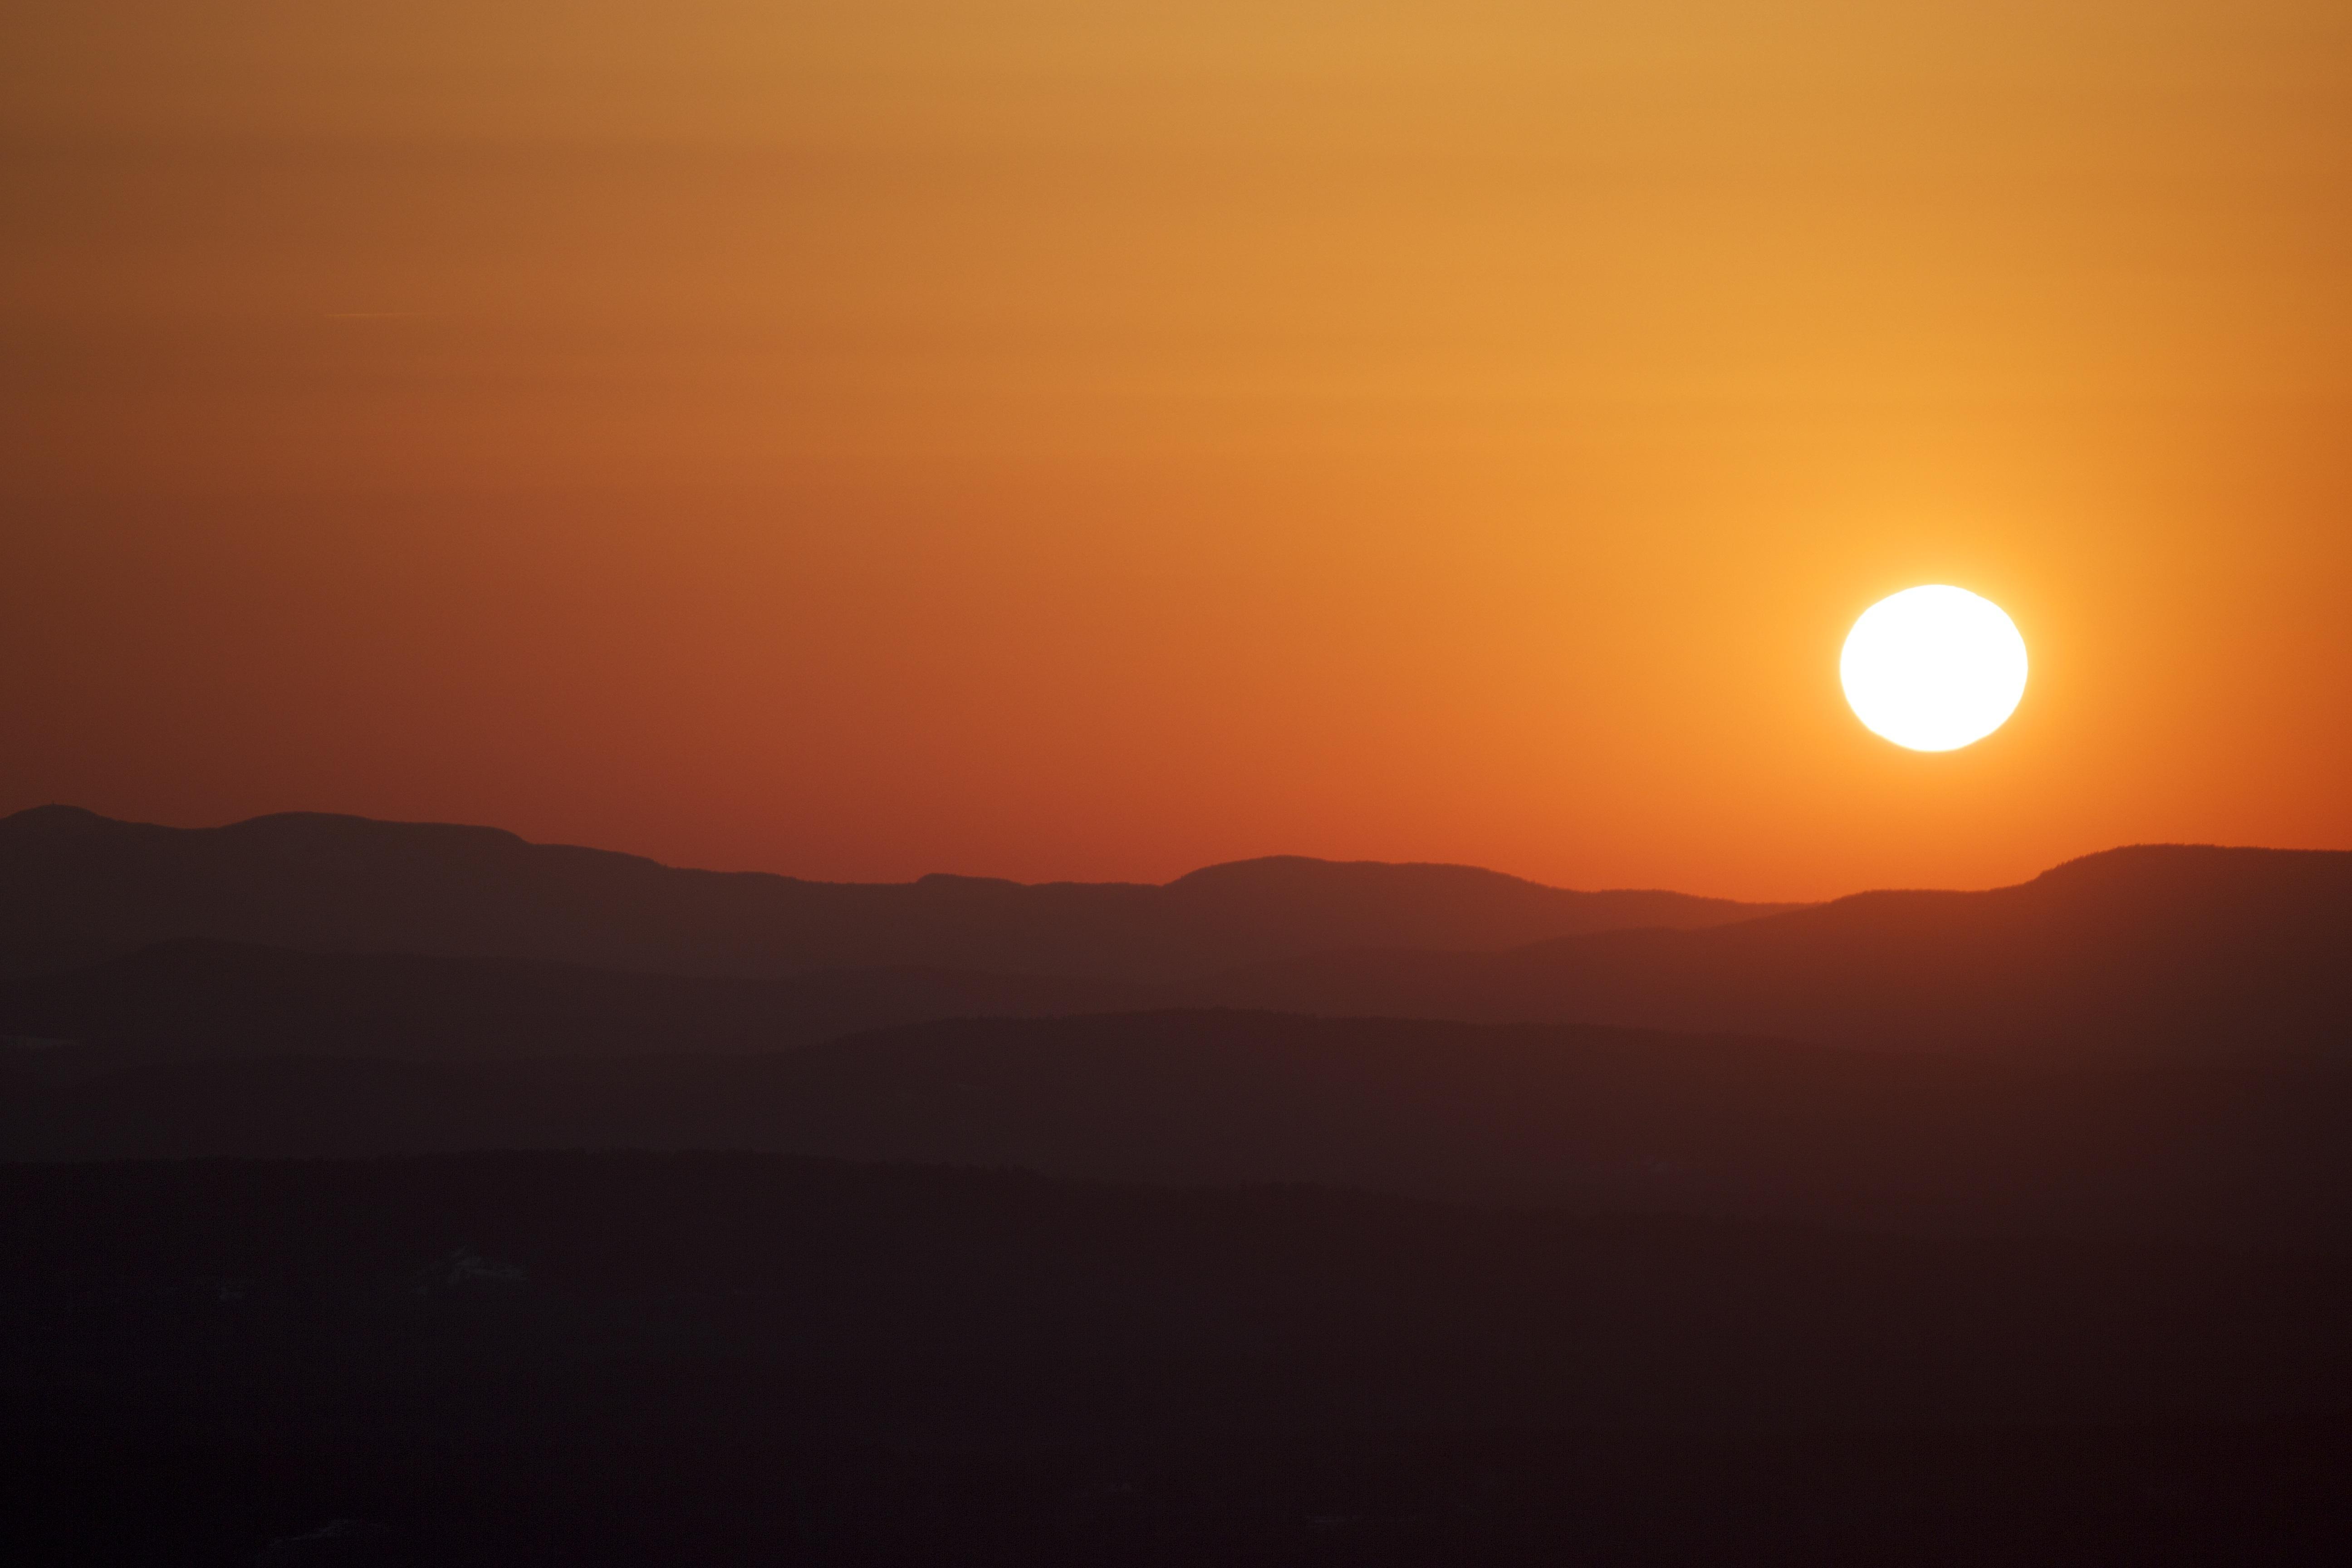 Free images landscape horizon sun sunrise sunset sunlight free images landscape horizon sun sunrise sunset sunlight hill view dawn dusk daytime evening orange golden tranquil color scenery calm altavistaventures Images